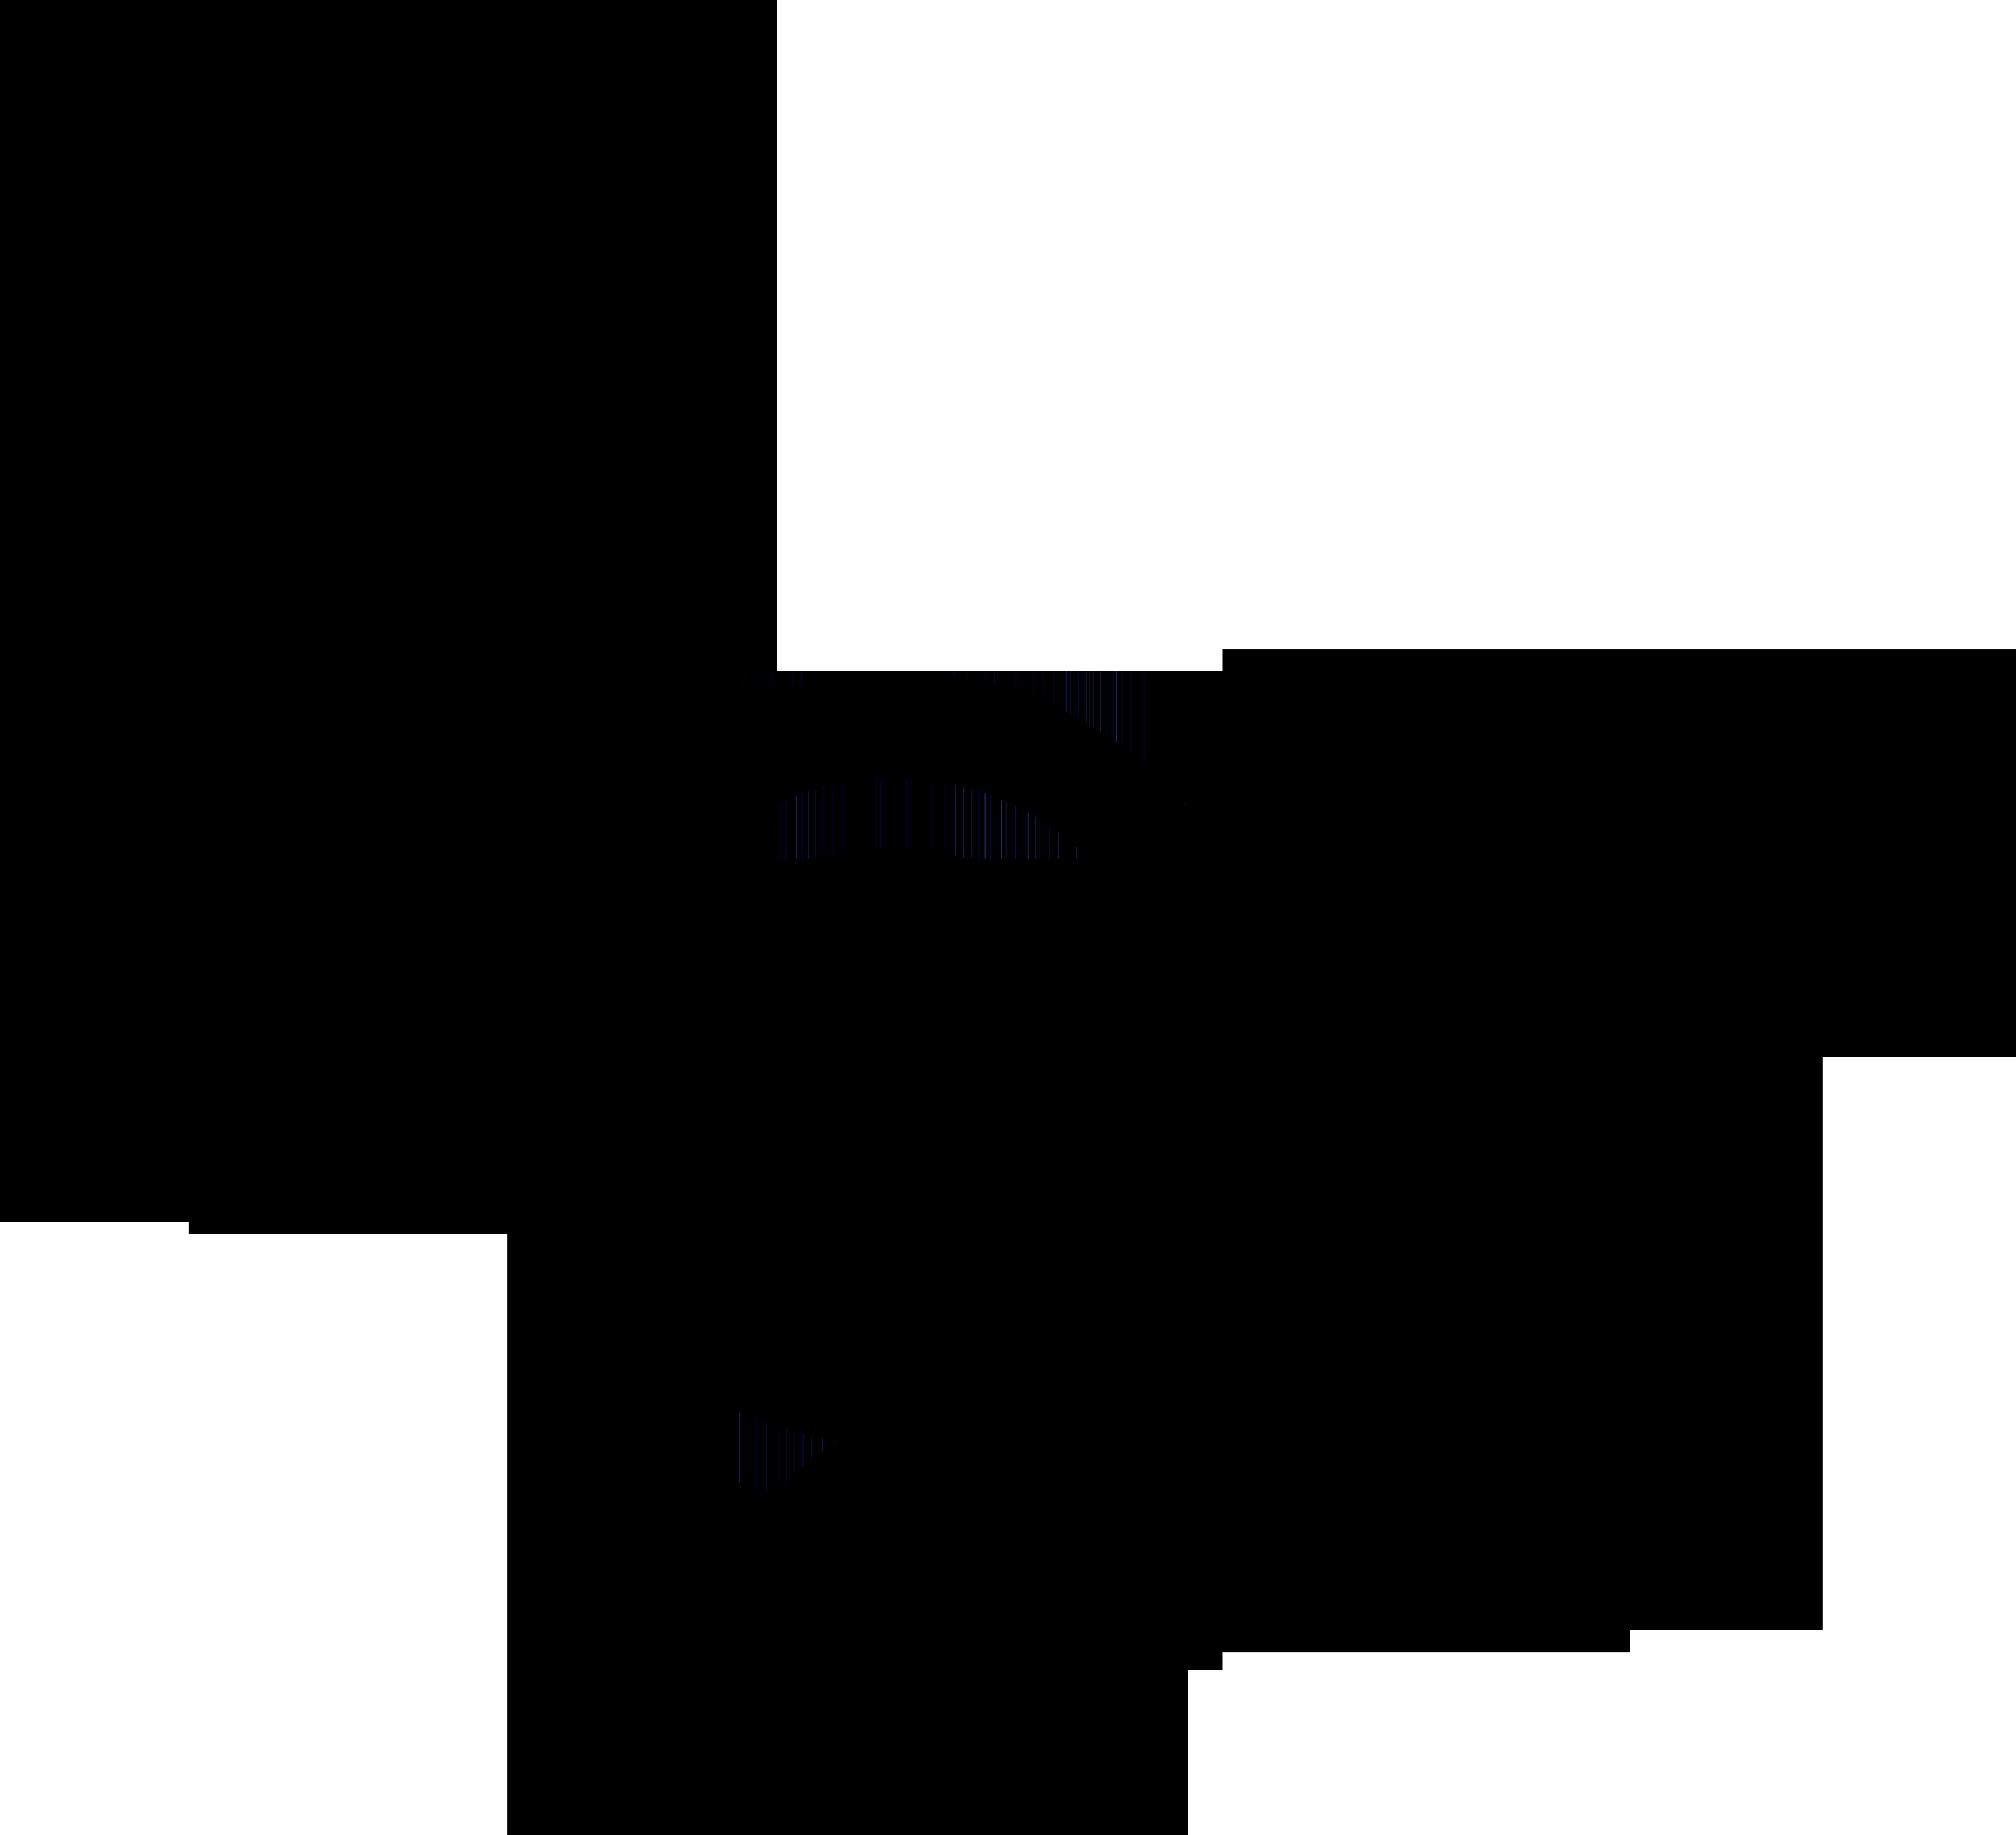 Nonbinary woman symbol interlocked with a nonbinary symbol and a Mars symbol.